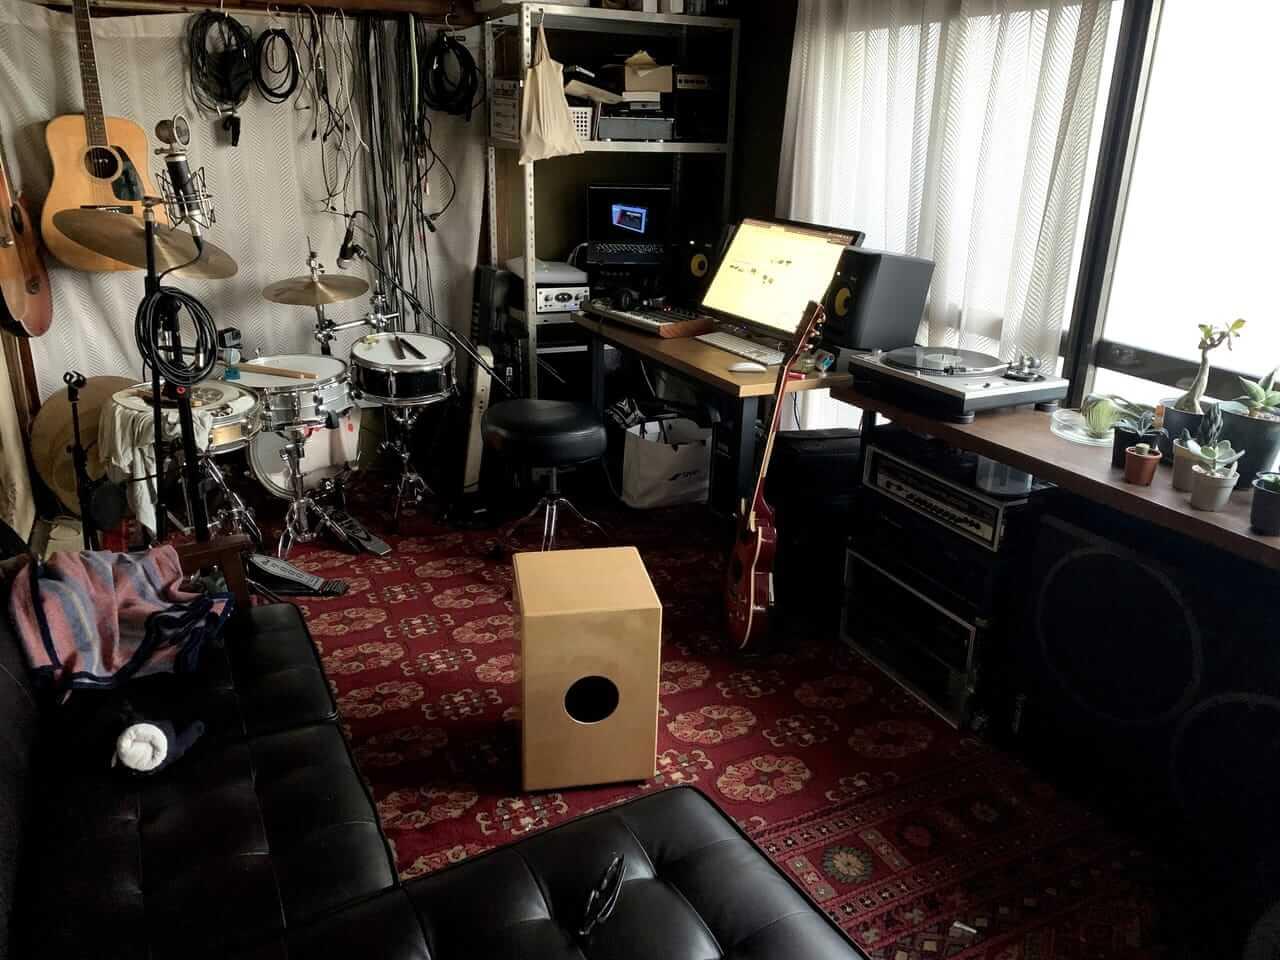 【IYOW 】 ryo takahashi (ピスタチオスタジオ) 「常に偶発的に曲を作り始めたい」